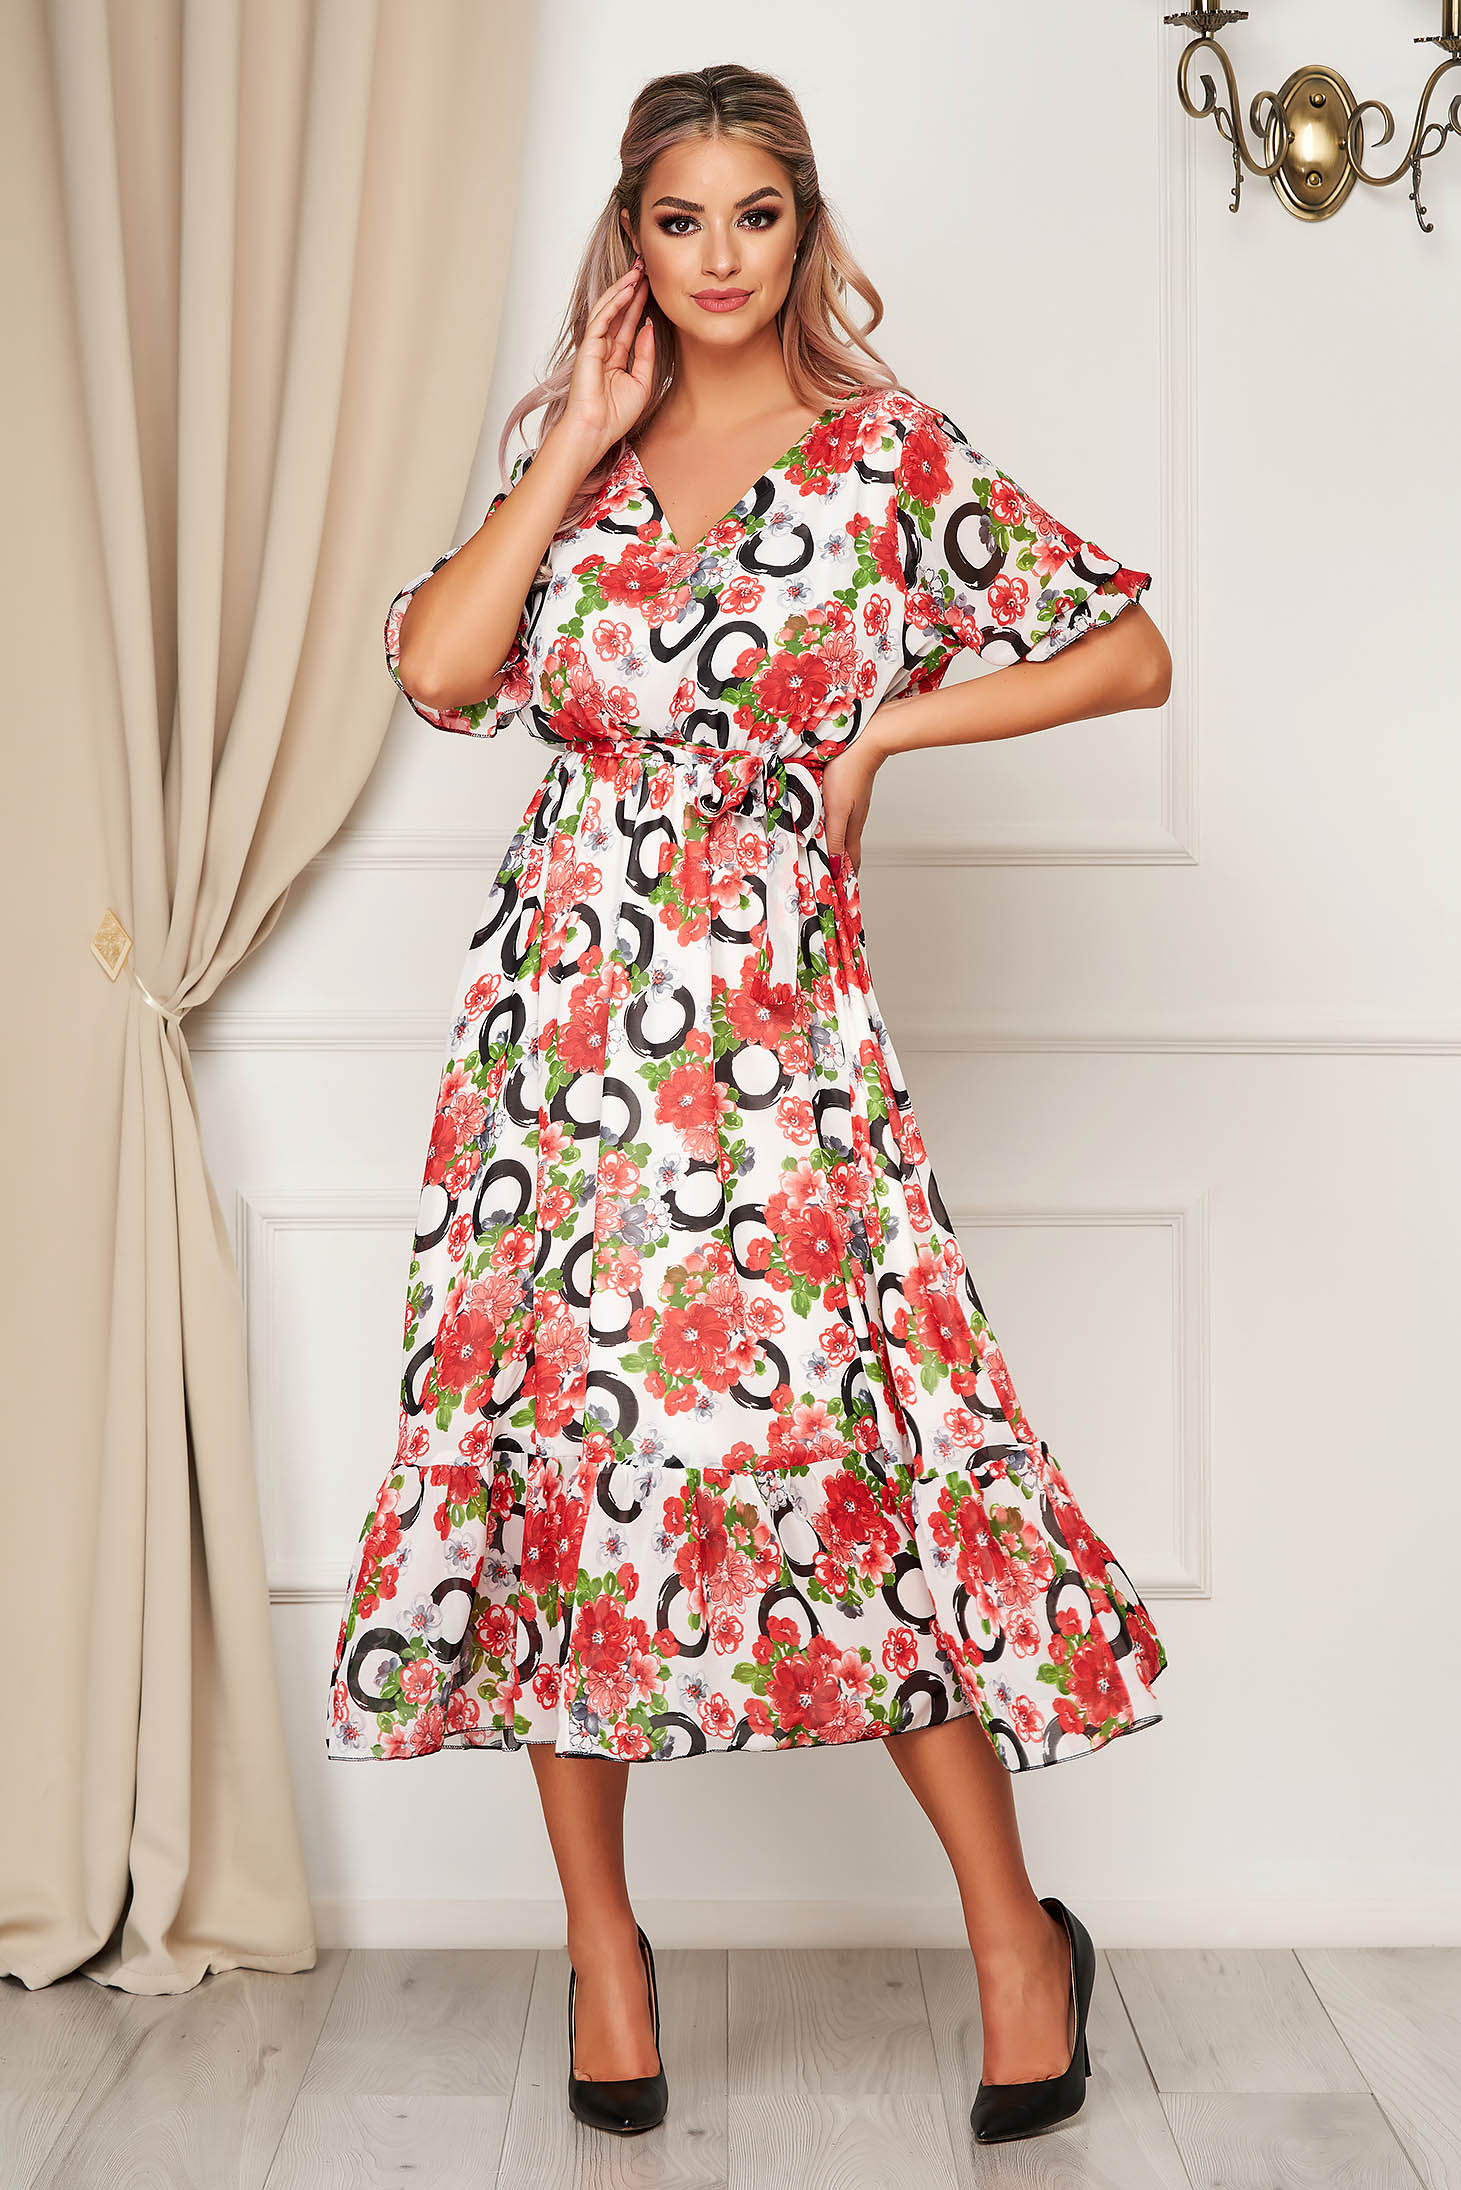 Rochie cu imprimeu floral de zi din voal clos cu elastic in talie cu volanase la baza rochiei